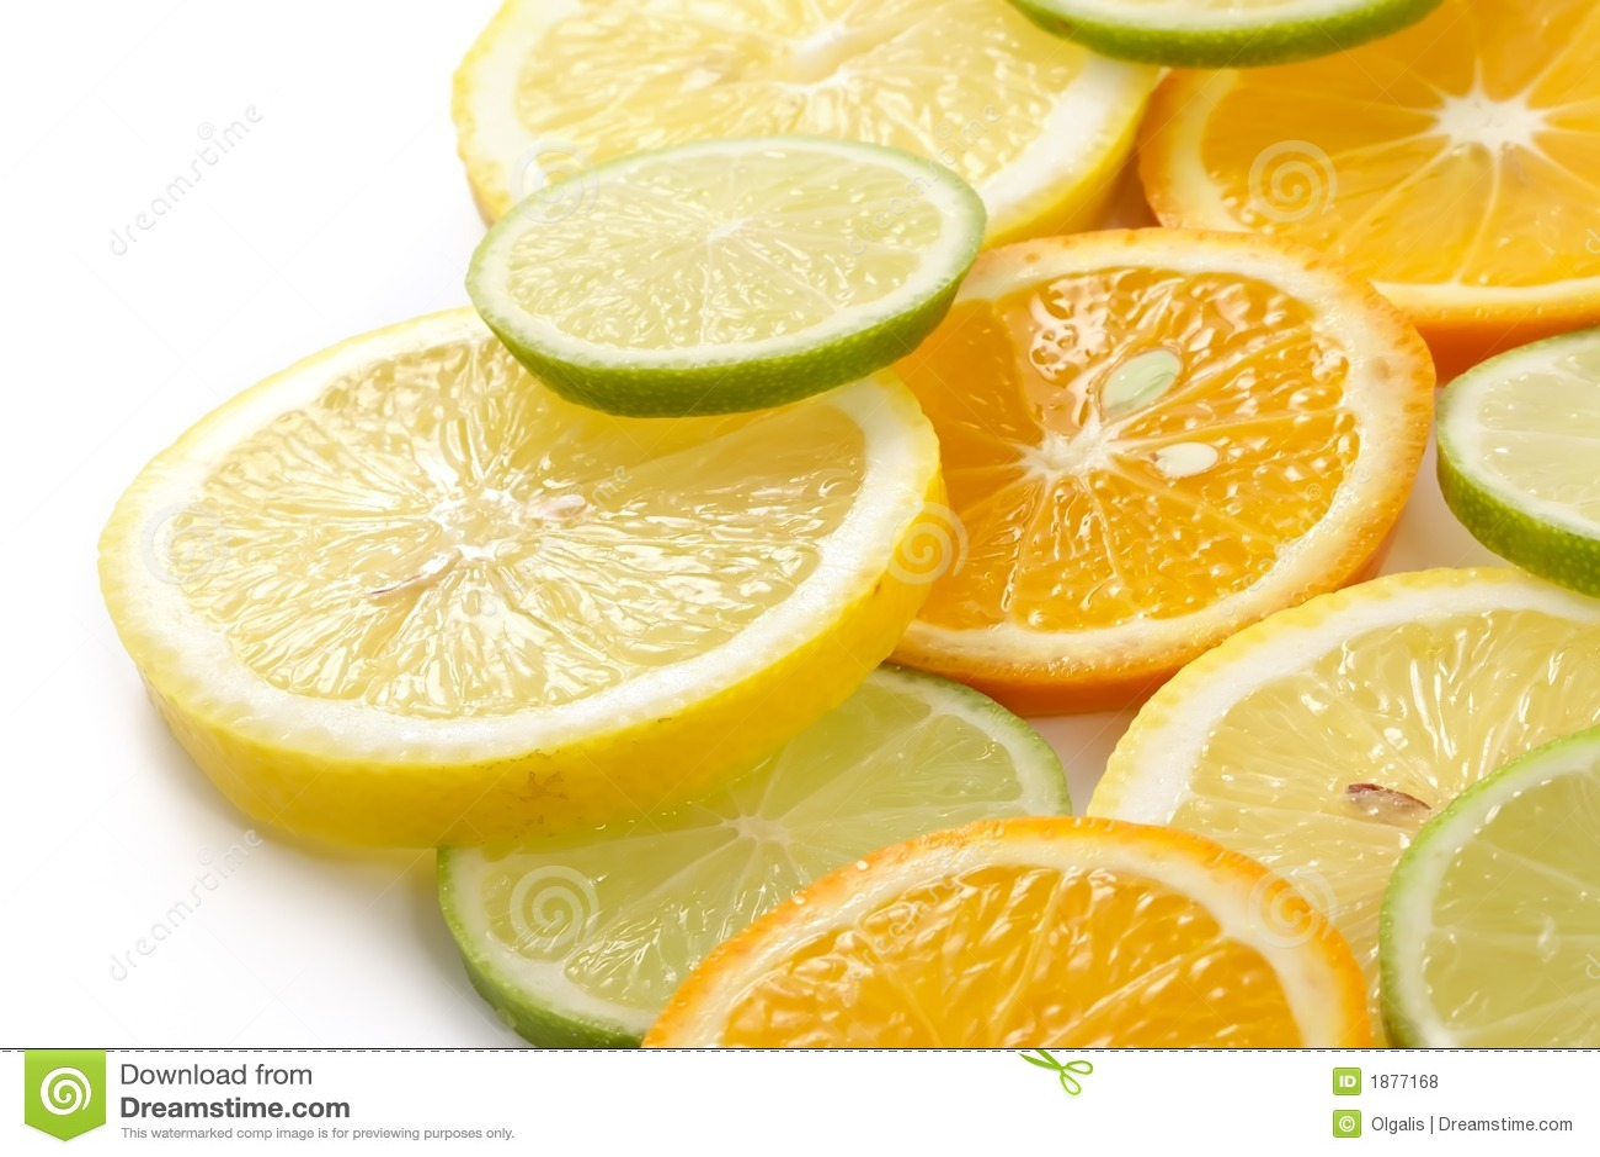 Allsorts-limette citron, citron, mandarine